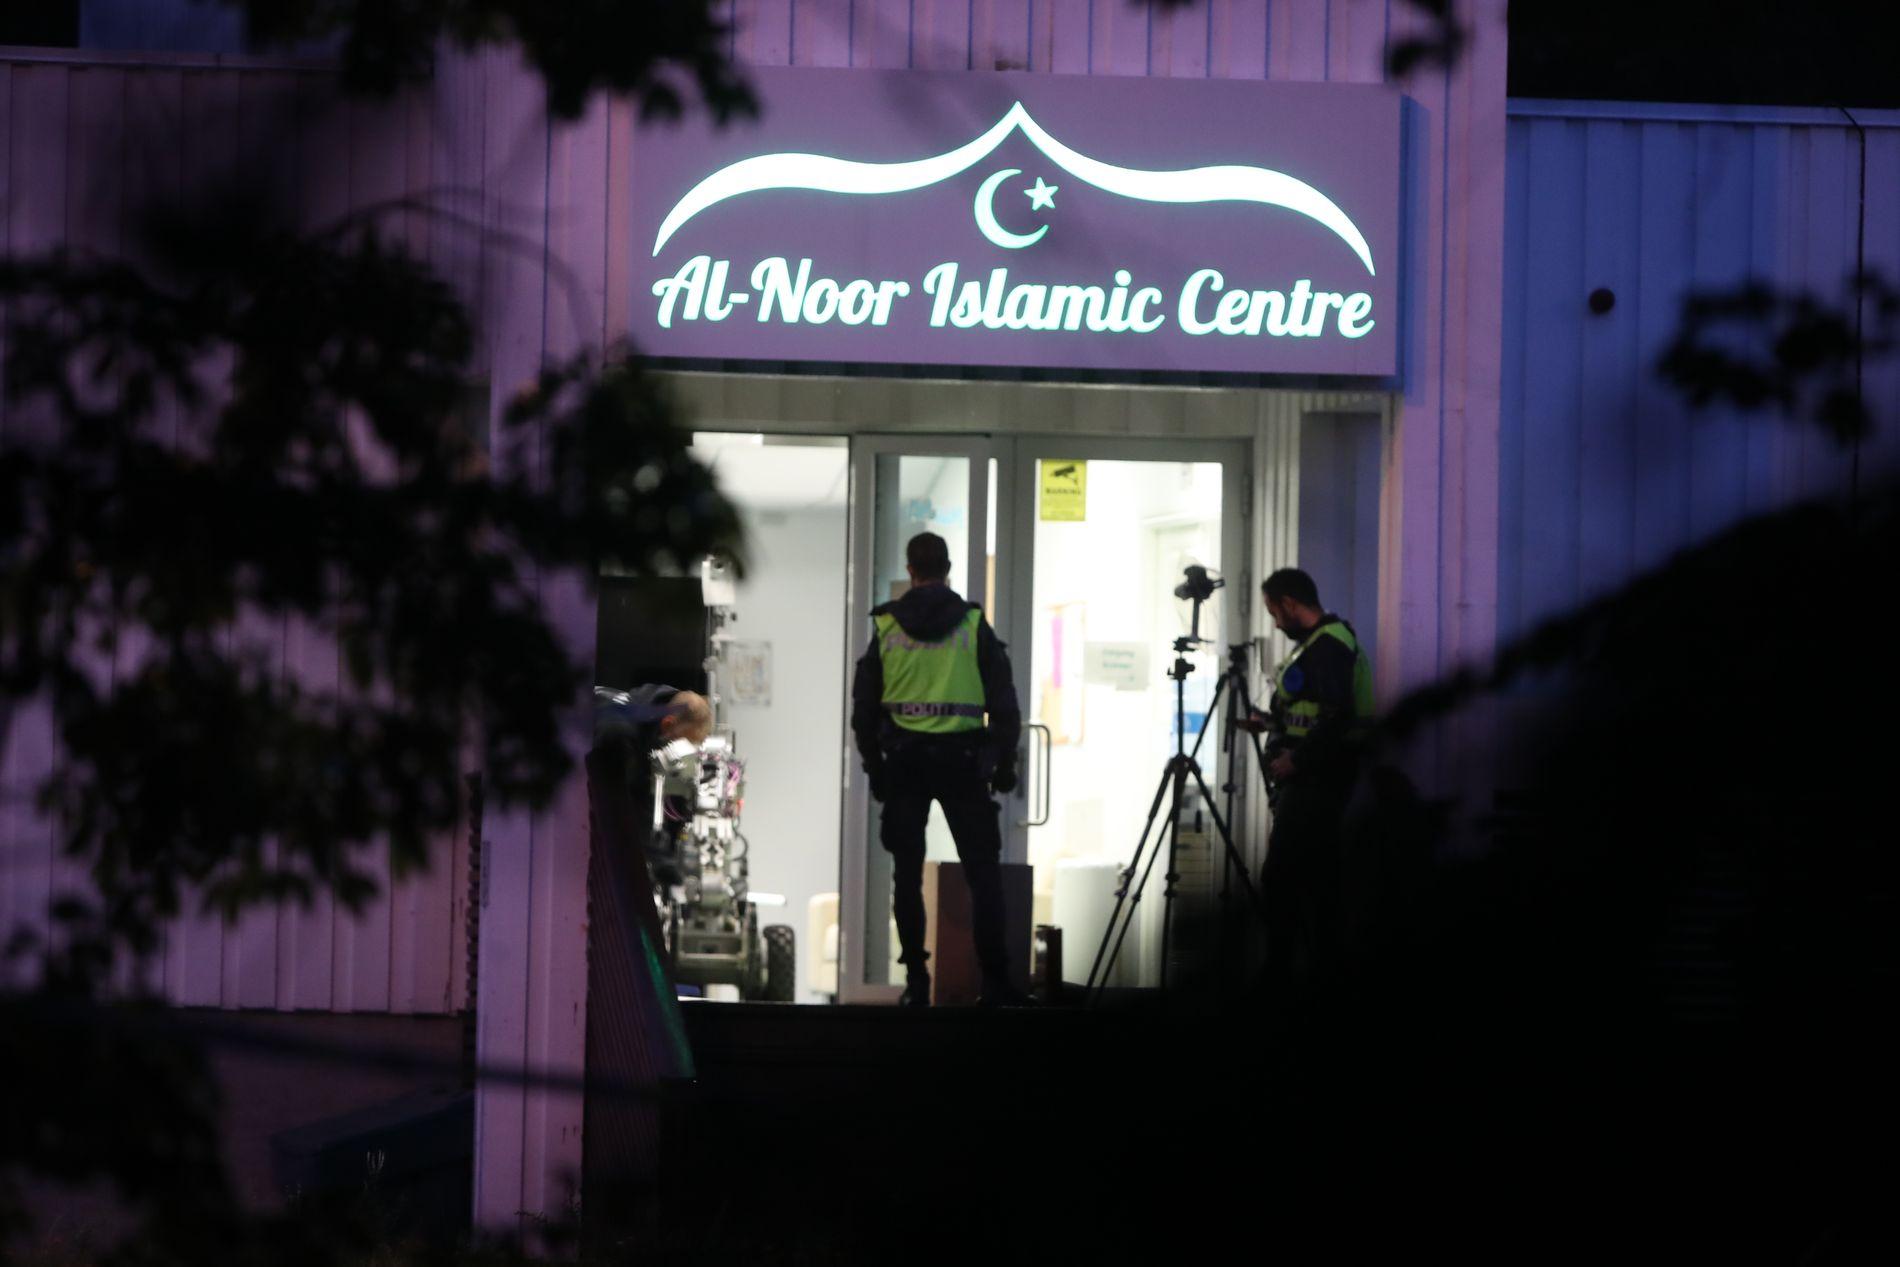 Skyteepisoden fant sted i al-Noor Islamic Center i Bærum lørdag.